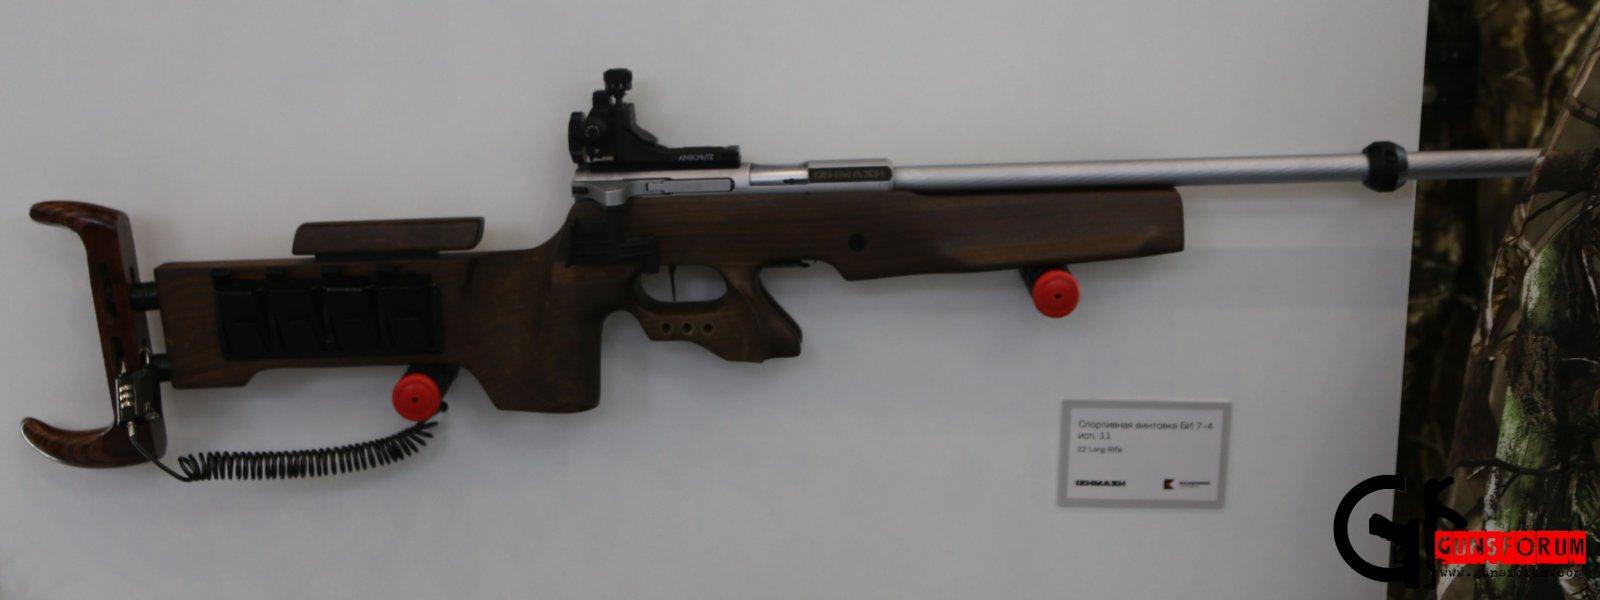 Спортивная винтовка Би 7-4 исп. 11 в калибре .22lr